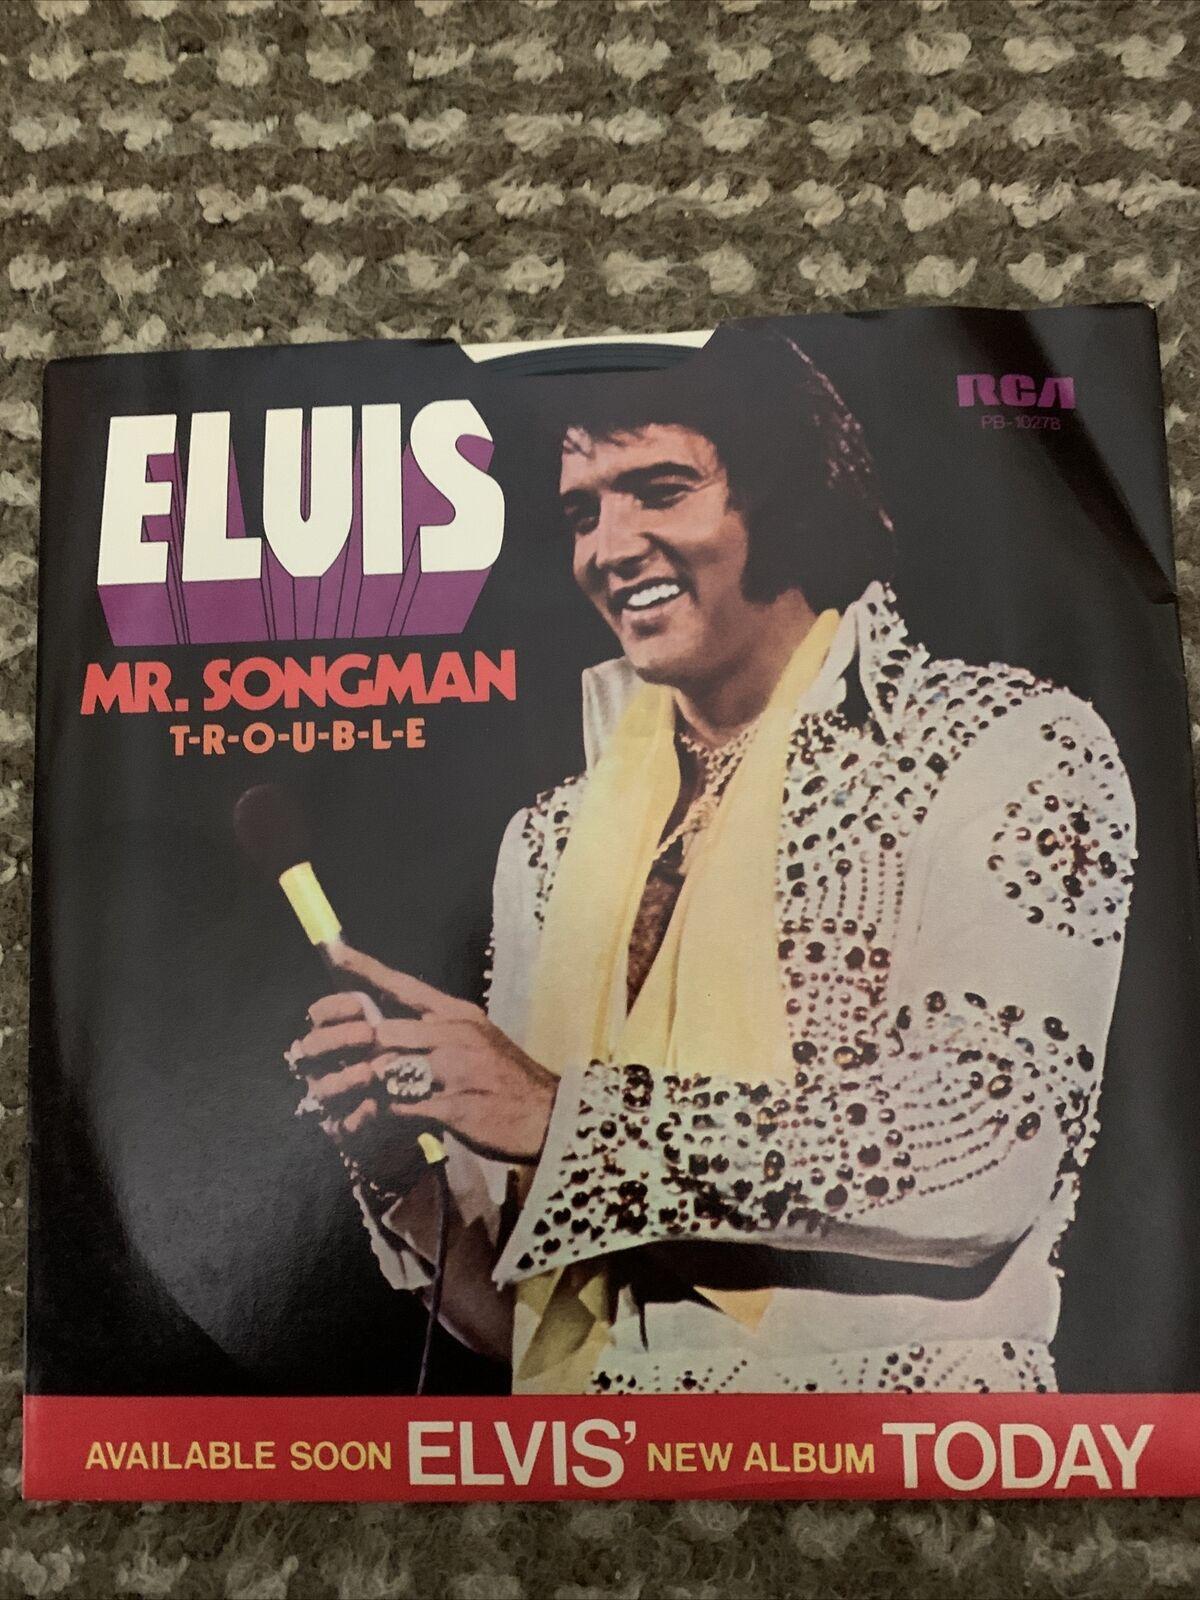 ELVIS PRESLEY / T-R-O-U-B-L-E - Mr. Songman / 45rpm & Picture Sleeve NICE